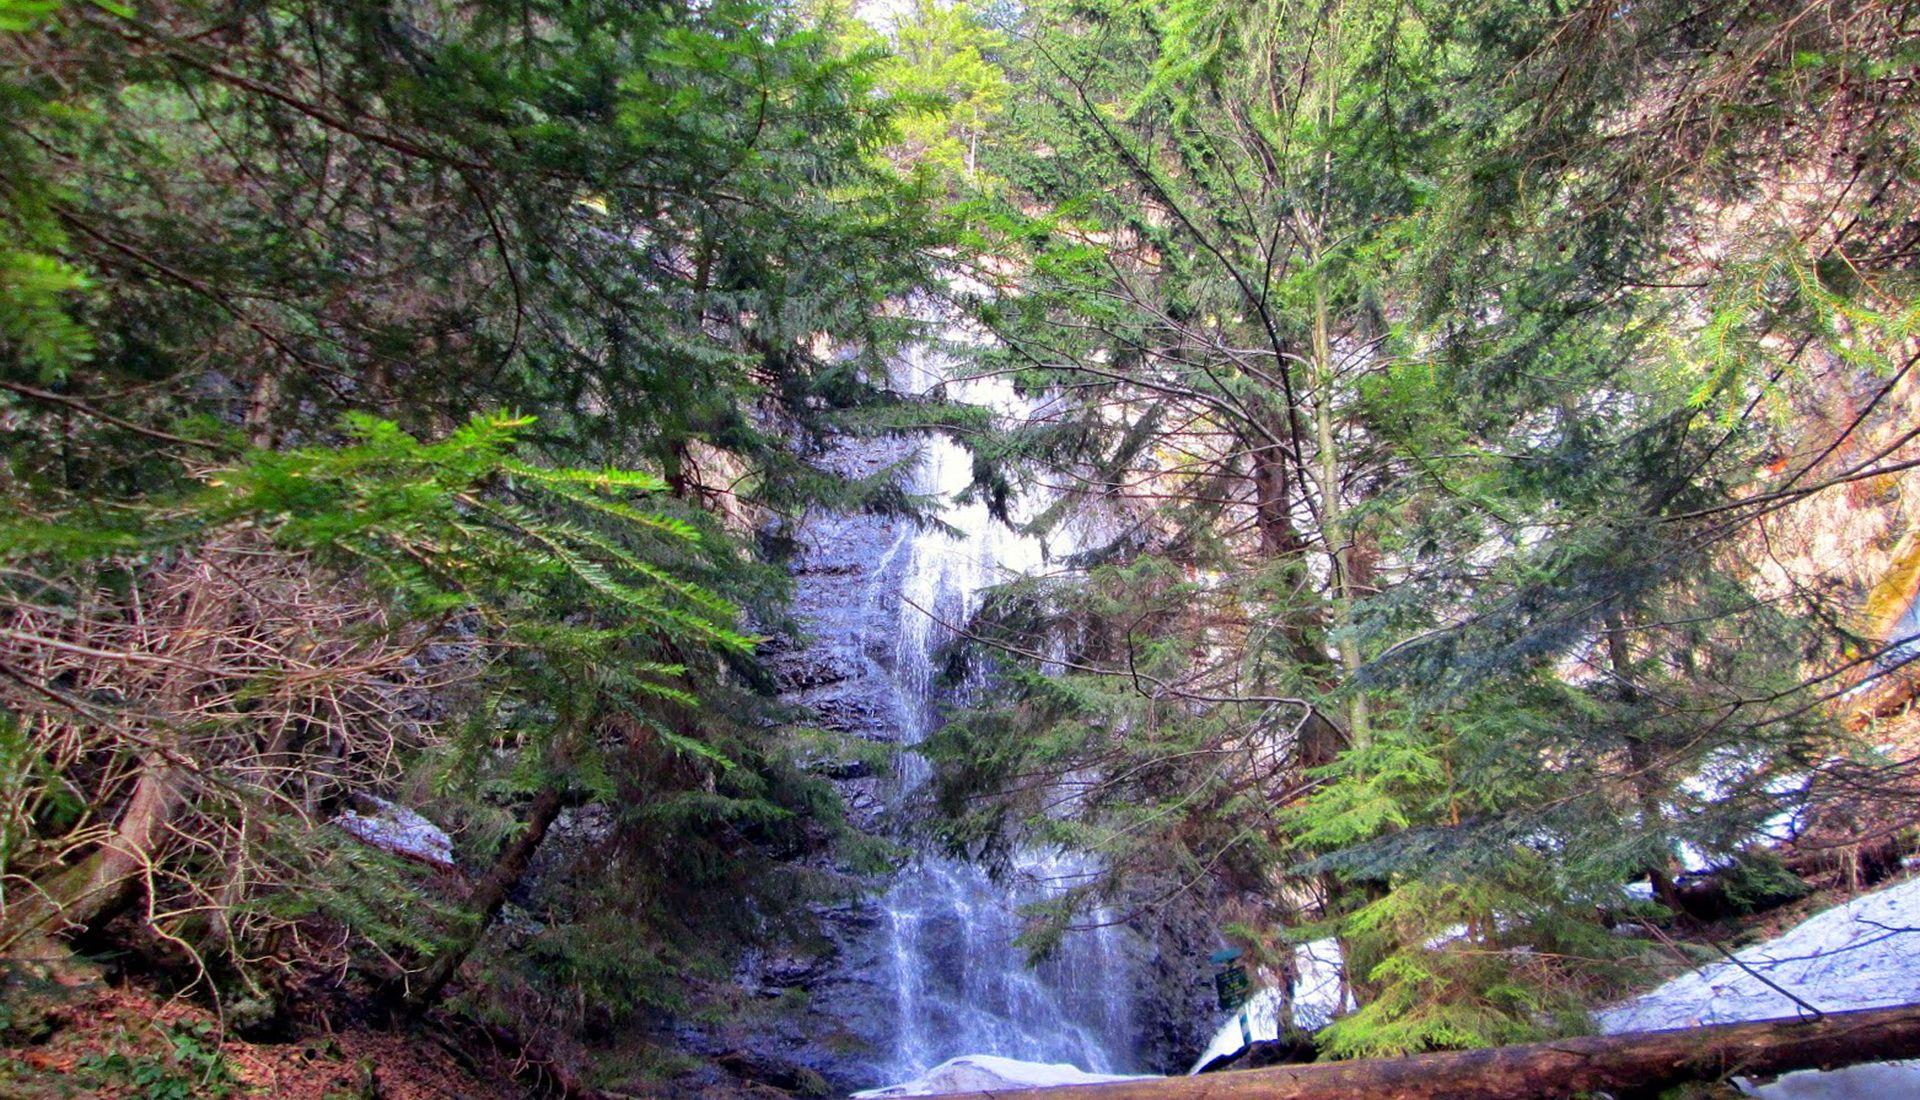 Чудо природы - Ялинский водопад в Раховском районе.